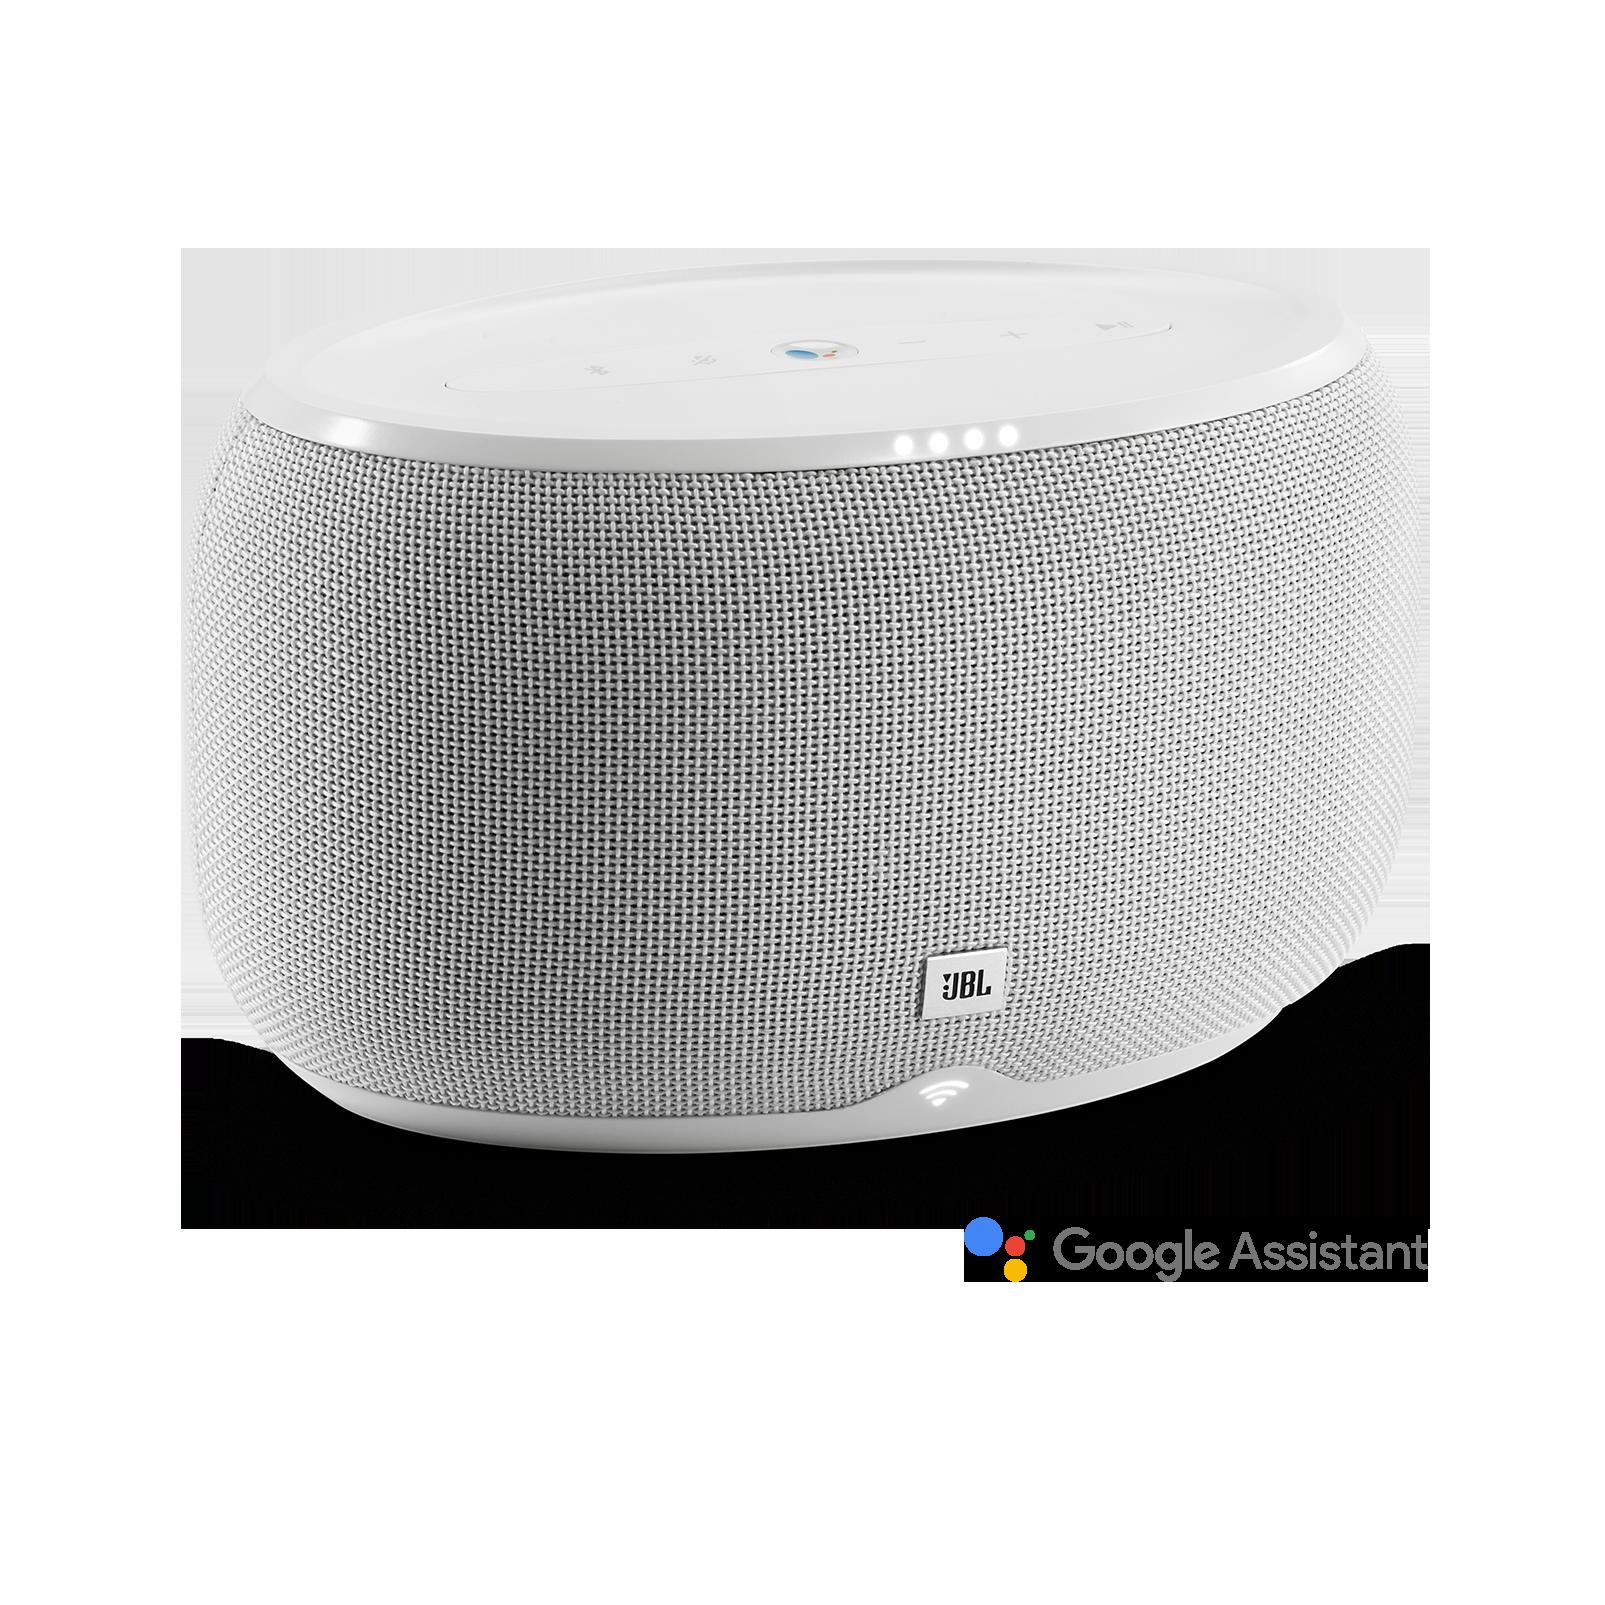 Jbl Link 300 Voice Activated Speaker # Uppleva Dimension